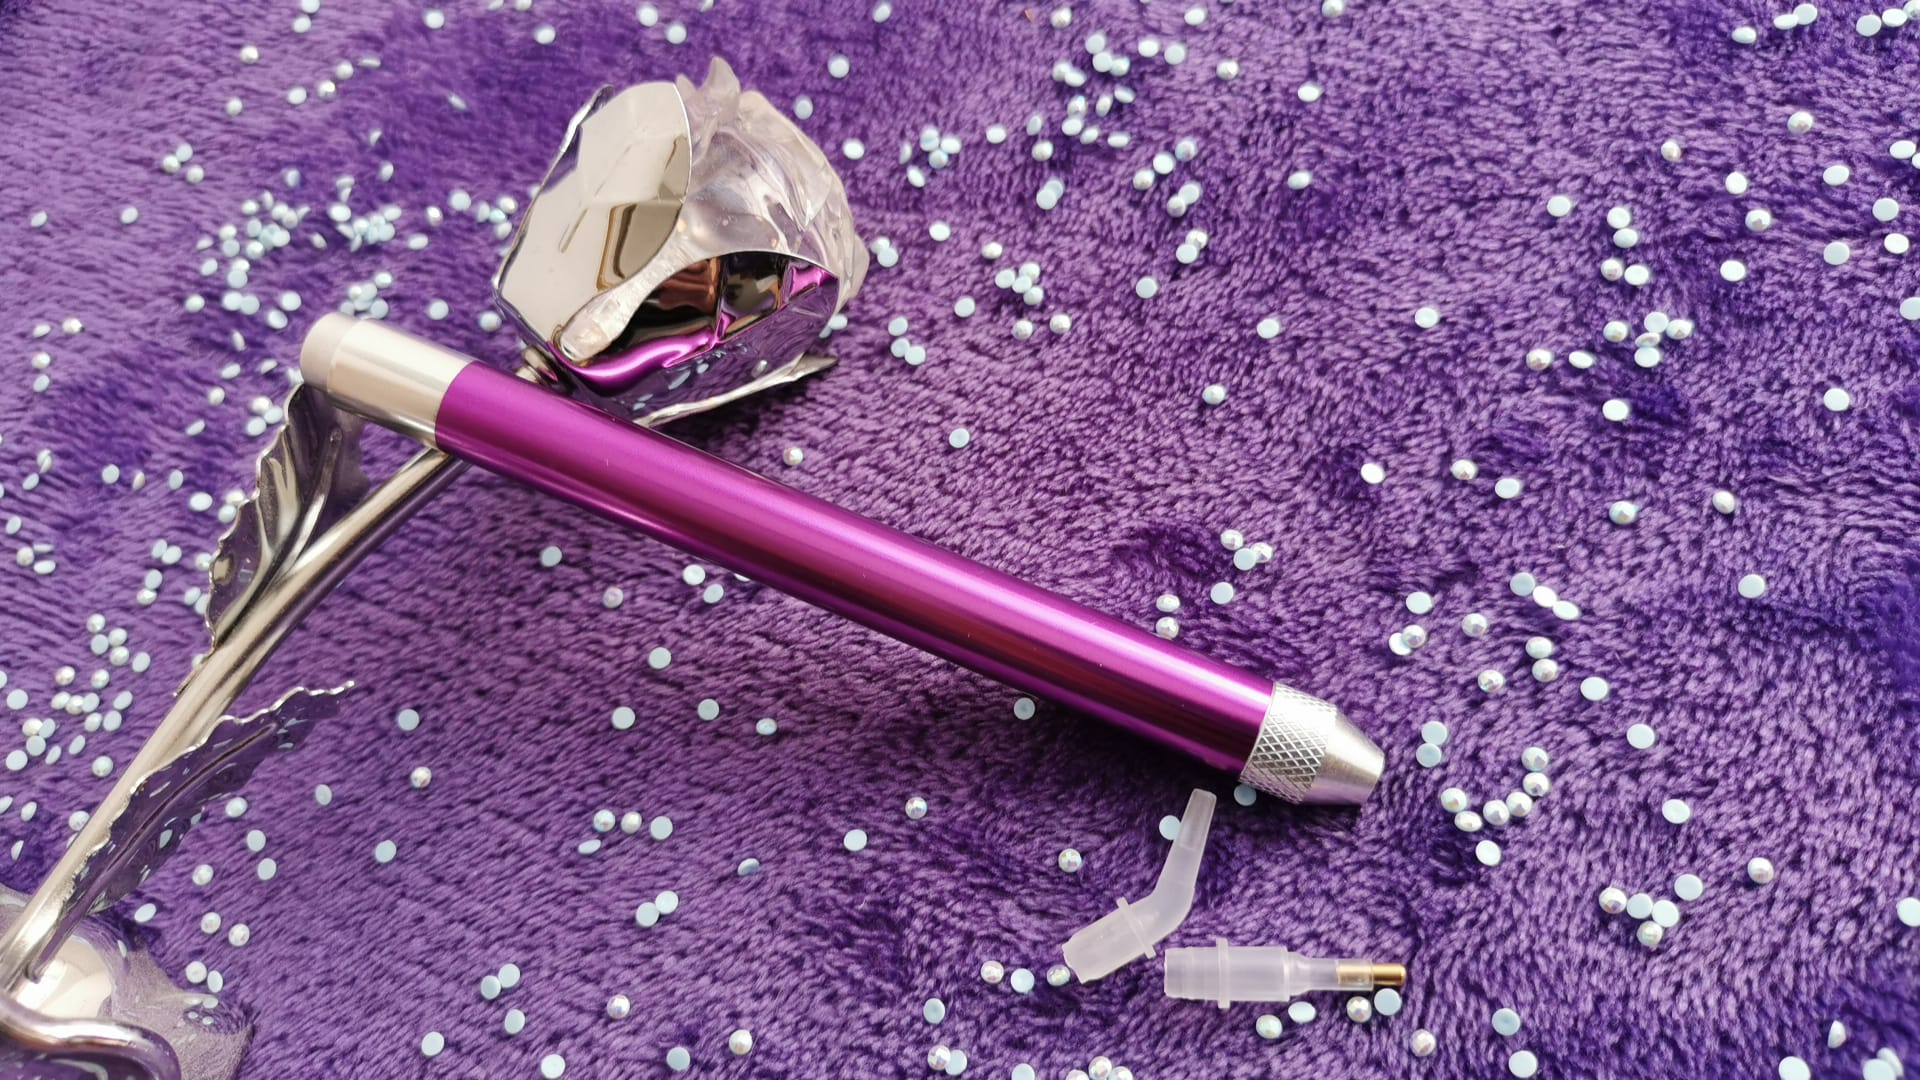 Diamond Painting Stifte und Cover Minder